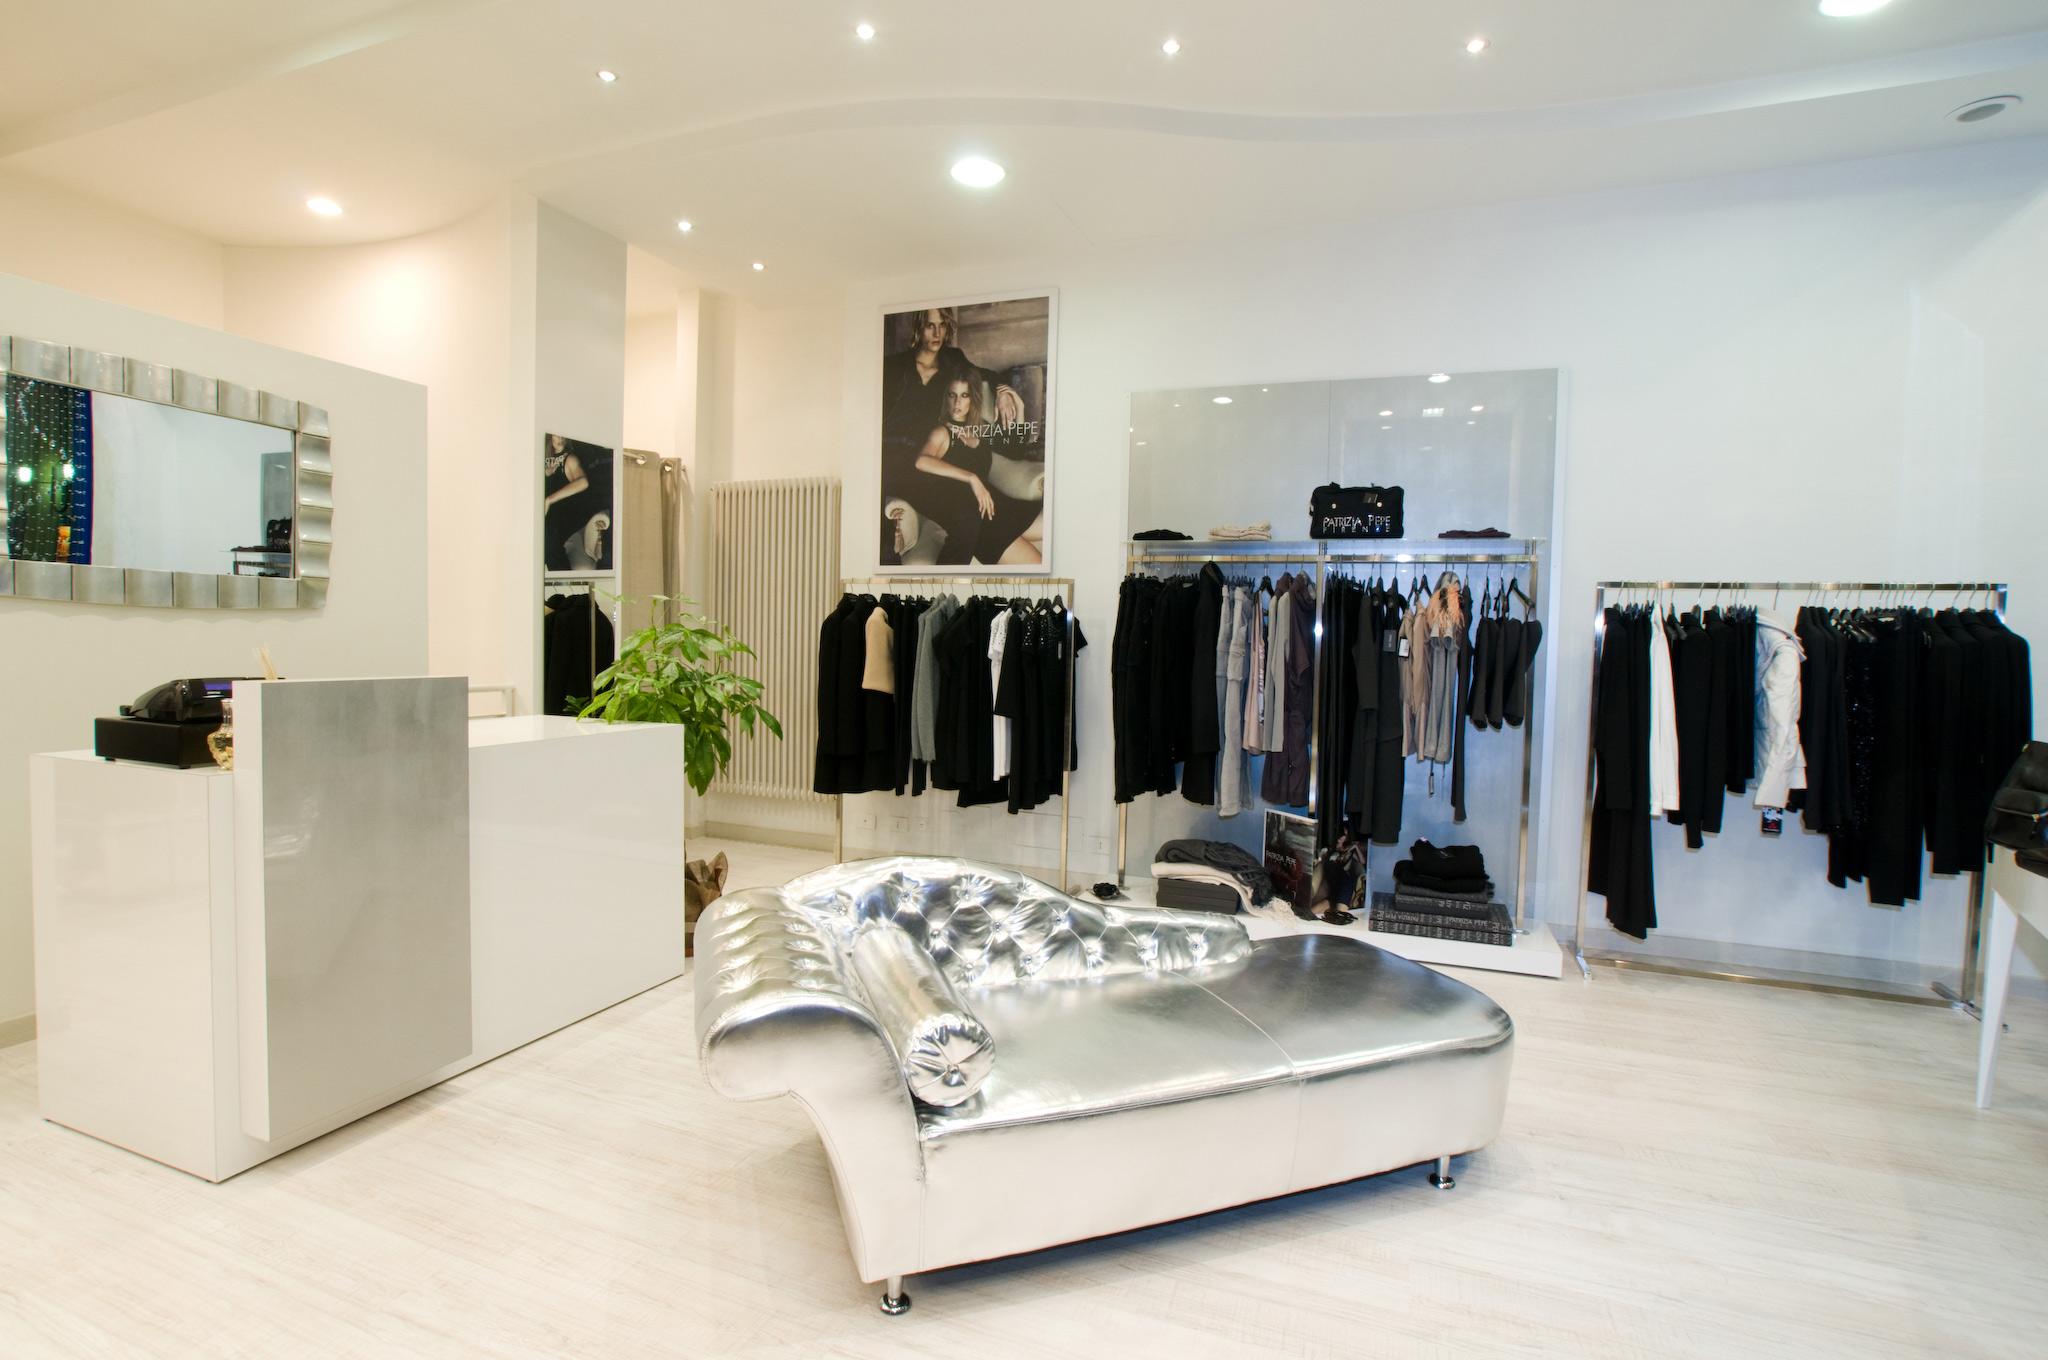 Arredamento per negozi di abbigliamento toscana belardi for Negozi arredamento pesaro